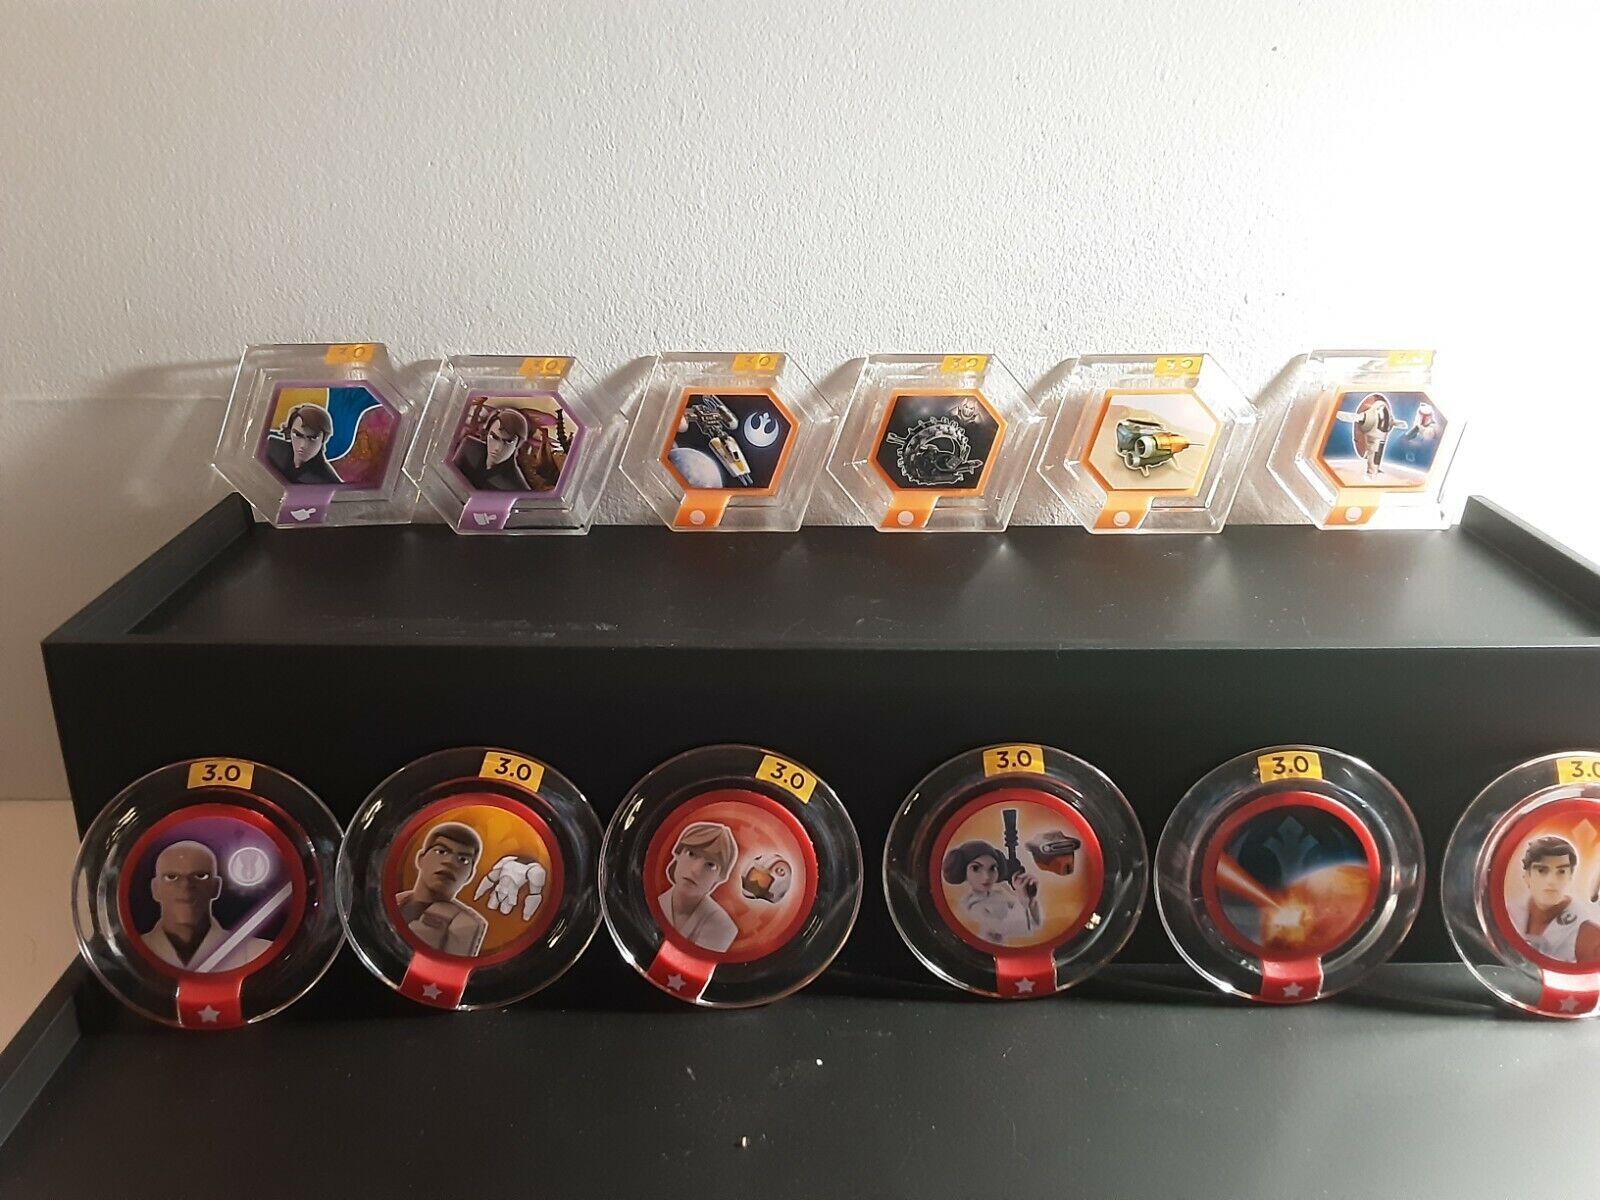 Lot Of 12 Disney Infinity Power Discs Star Wars - $20.00